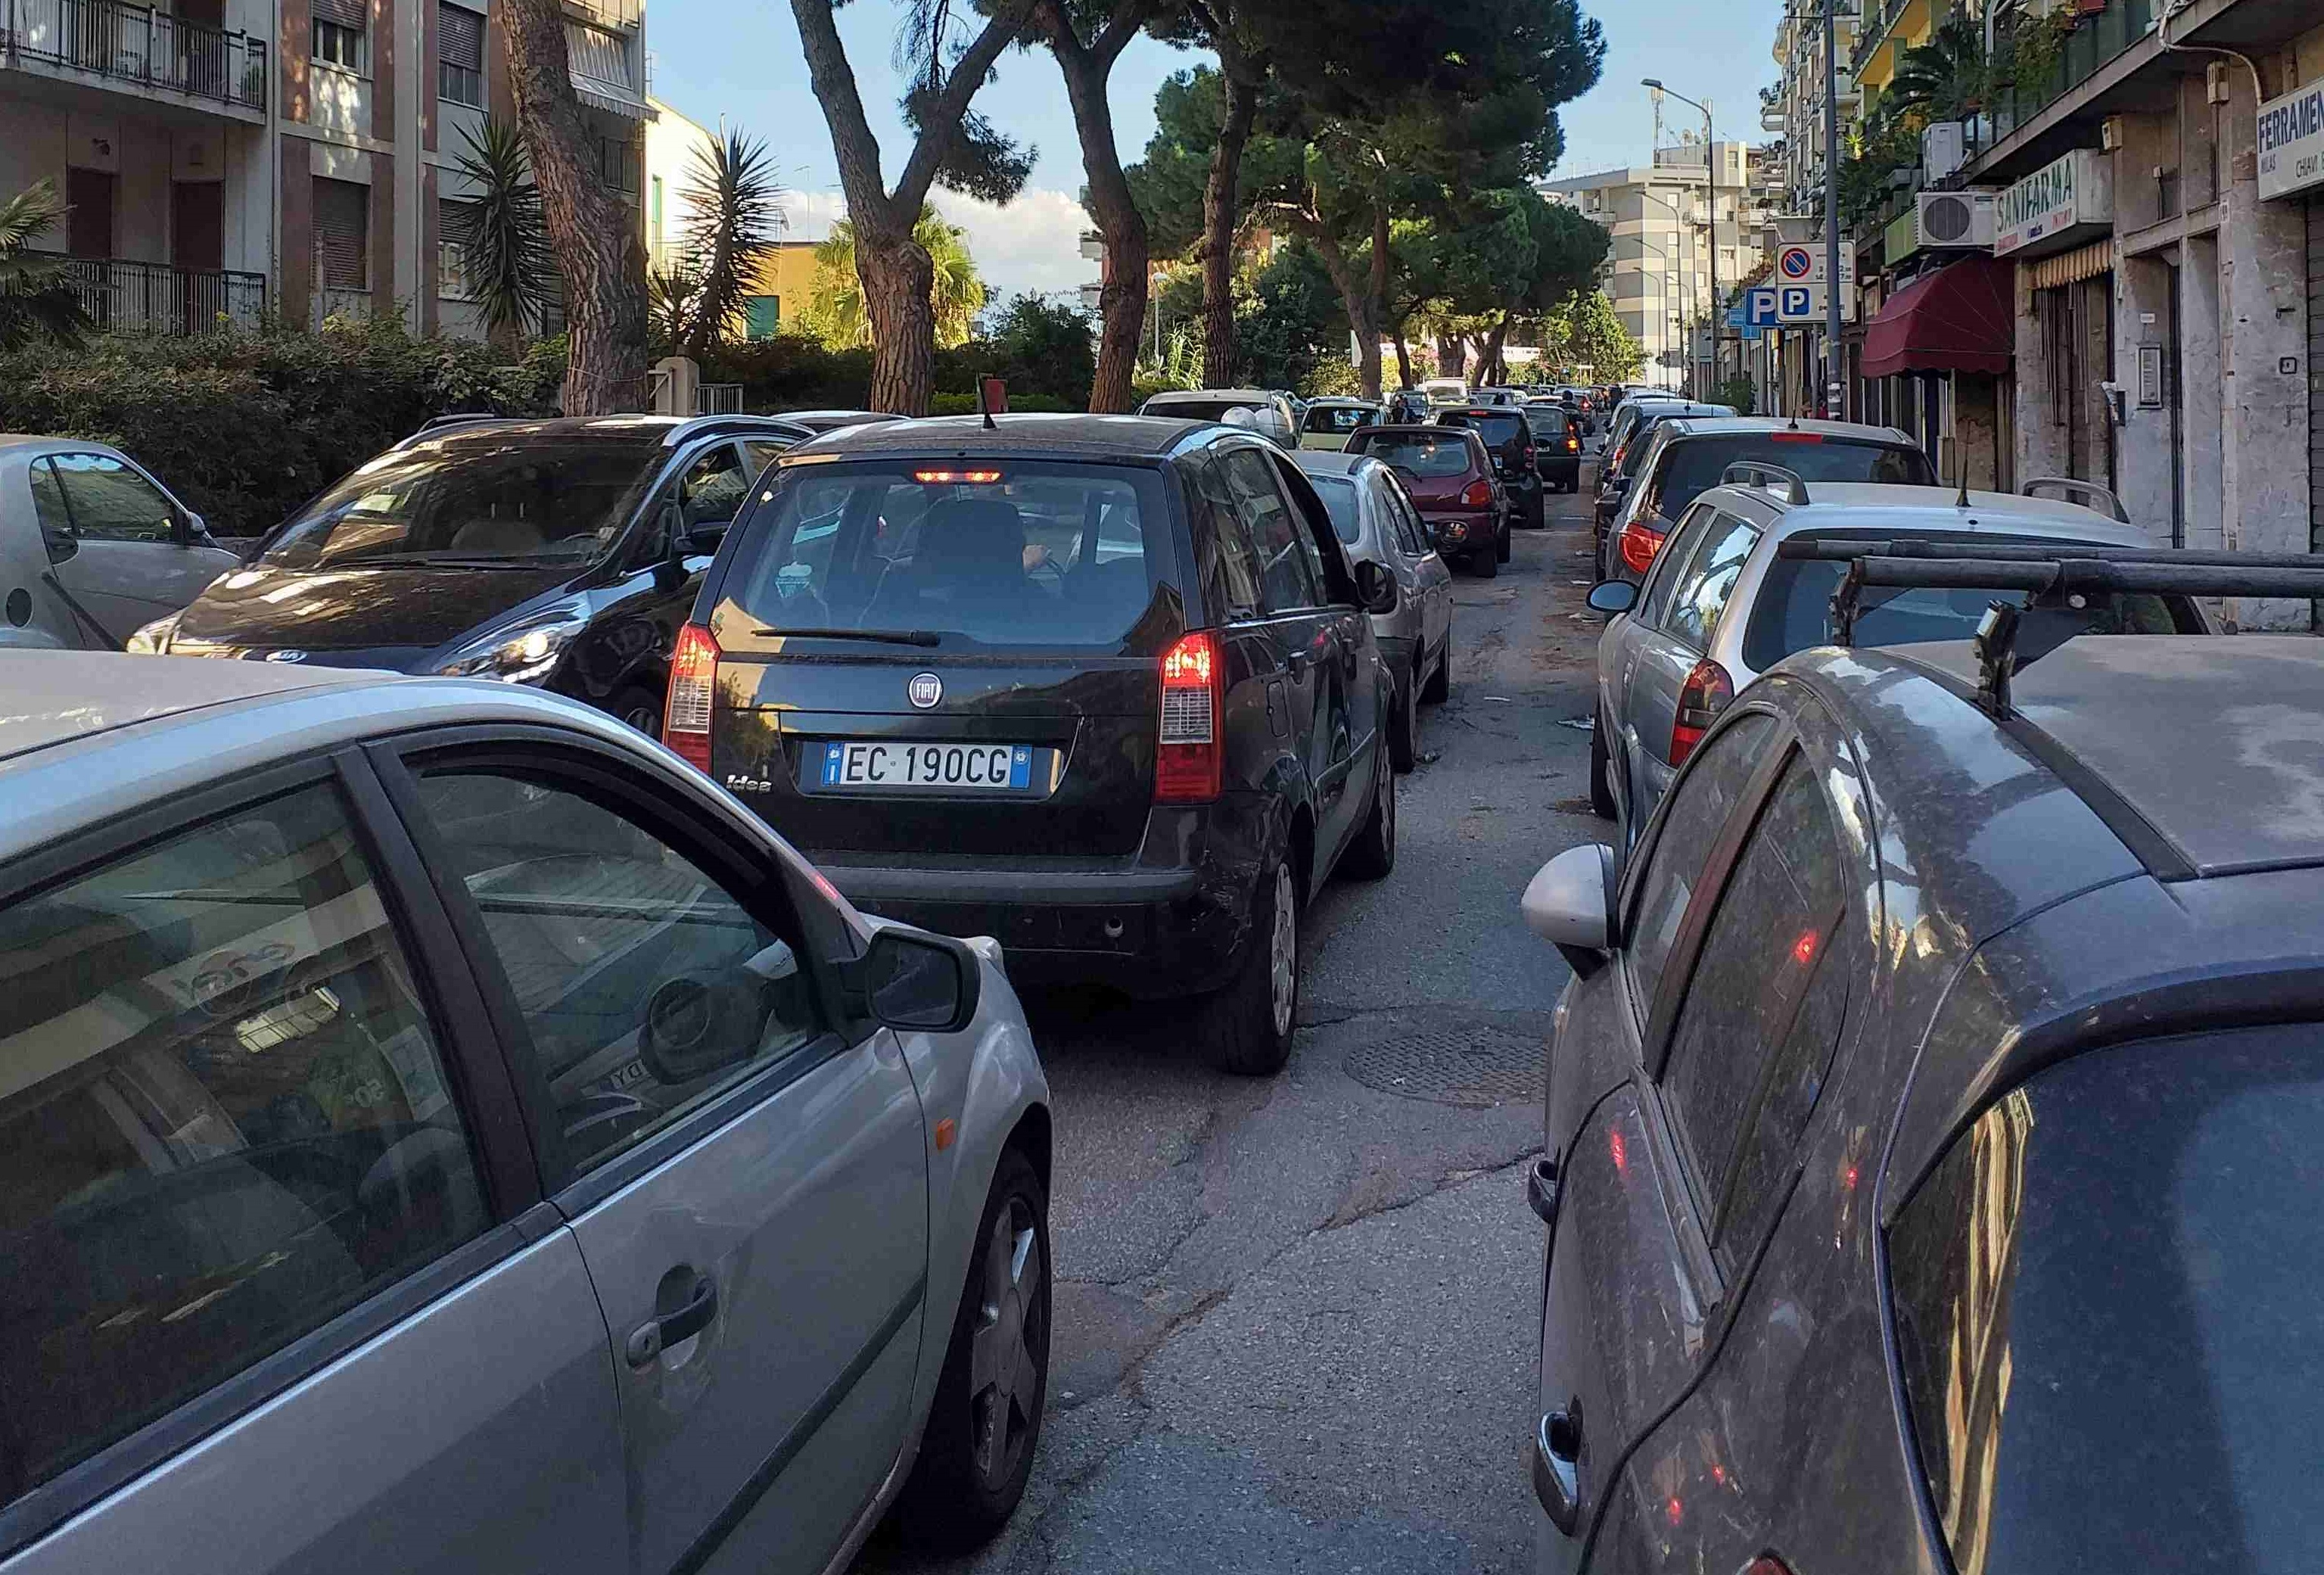 Interventi urgenti sulle alberature: possibili disagi sul viale Regina Margherita